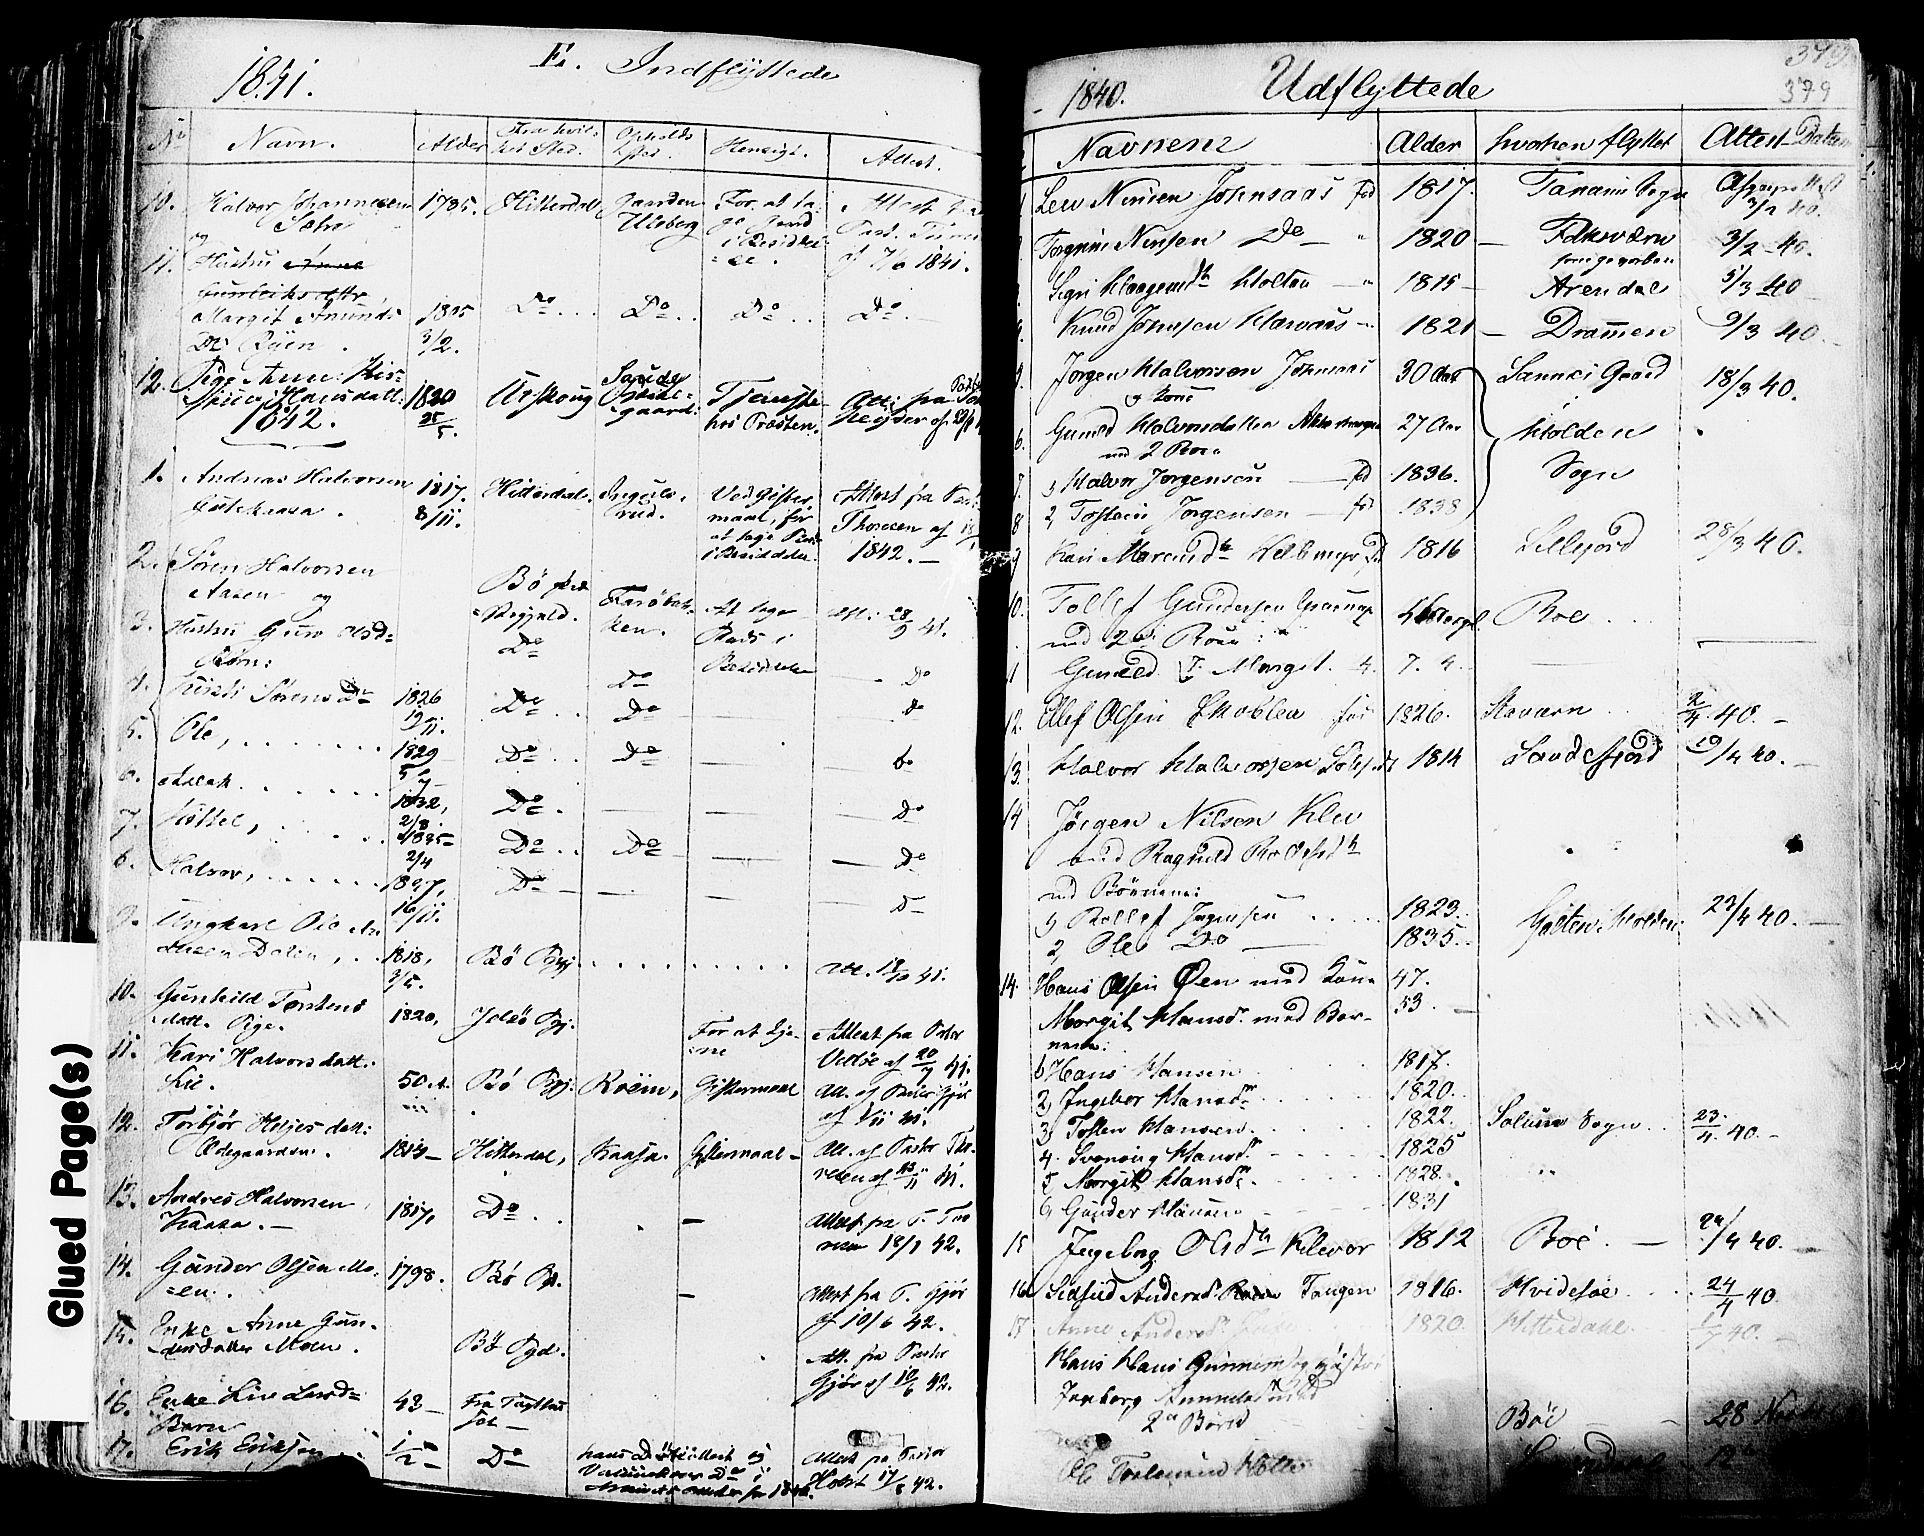 SAKO, Sauherad kirkebøker, F/Fa/L0006: Ministerialbok nr. I 6, 1827-1850, s. 379